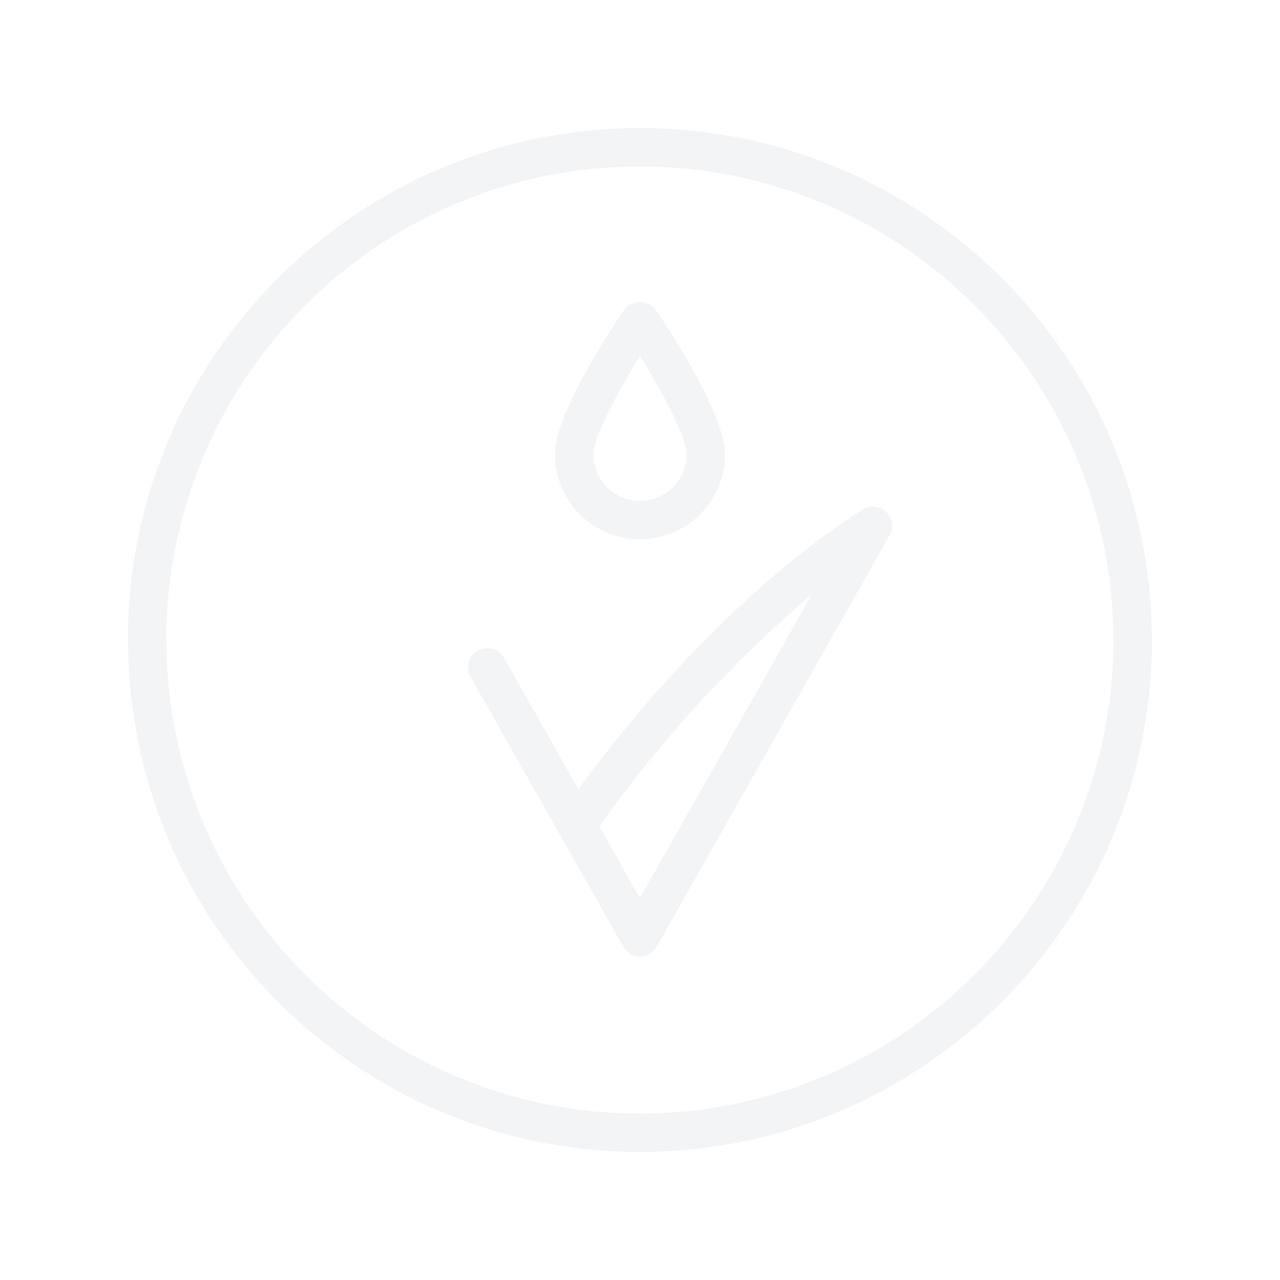 MIZON Water Volume Ex Cream 100ml